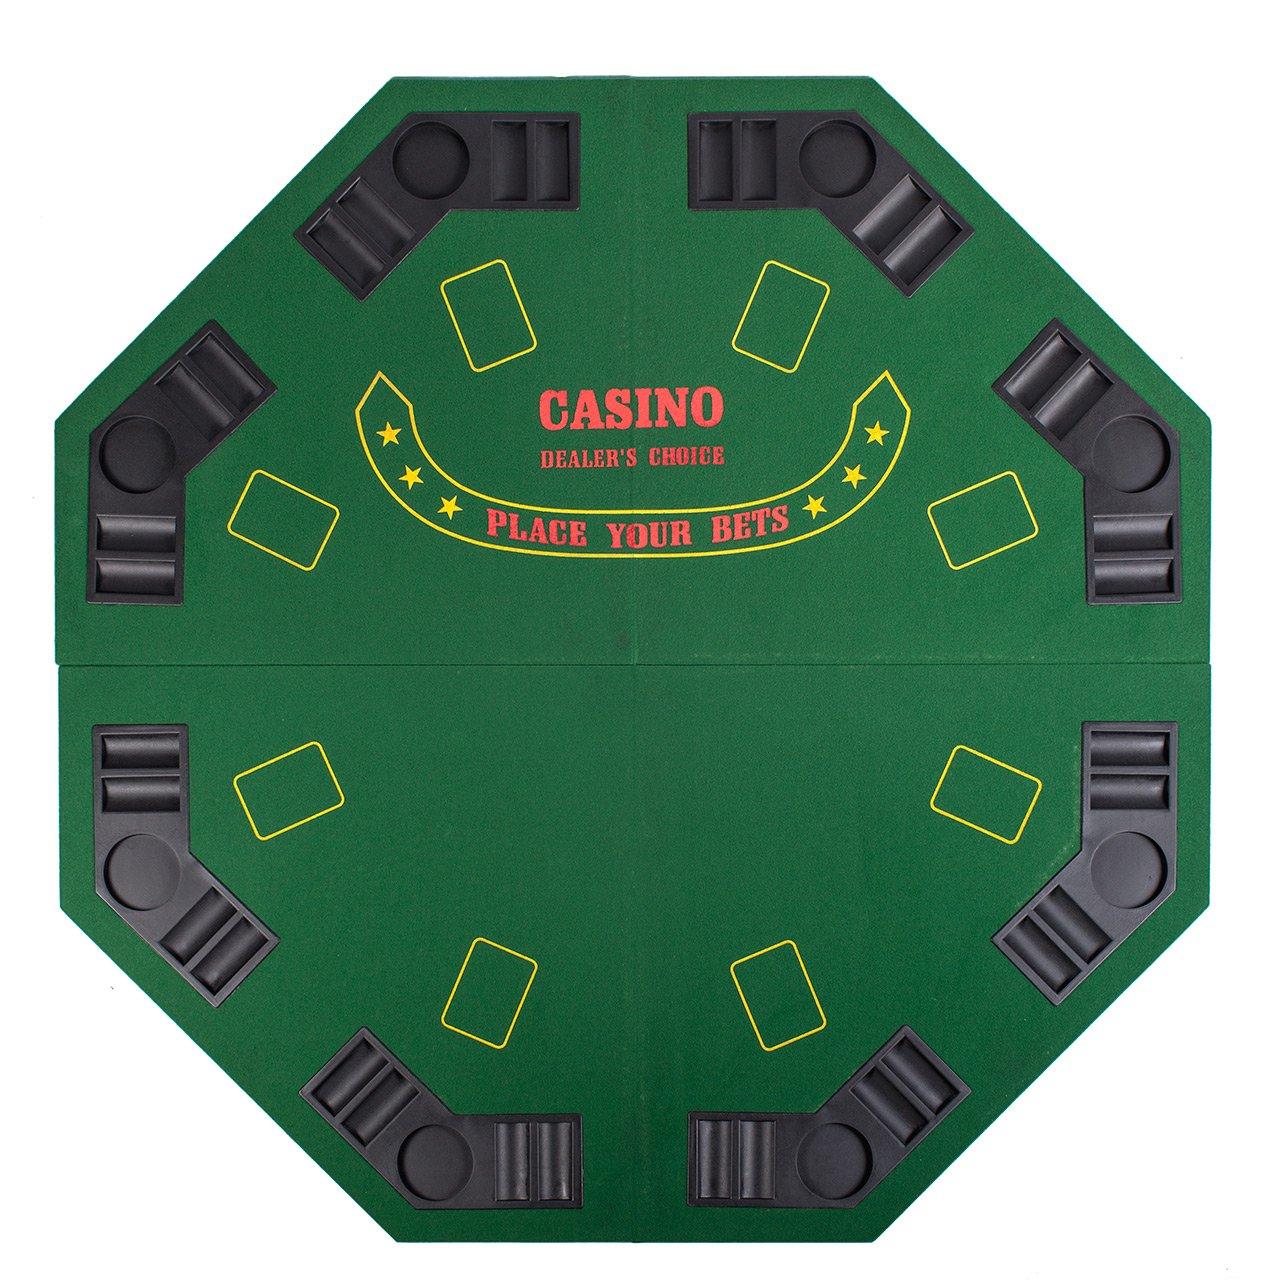 Hard rock orlando gambling